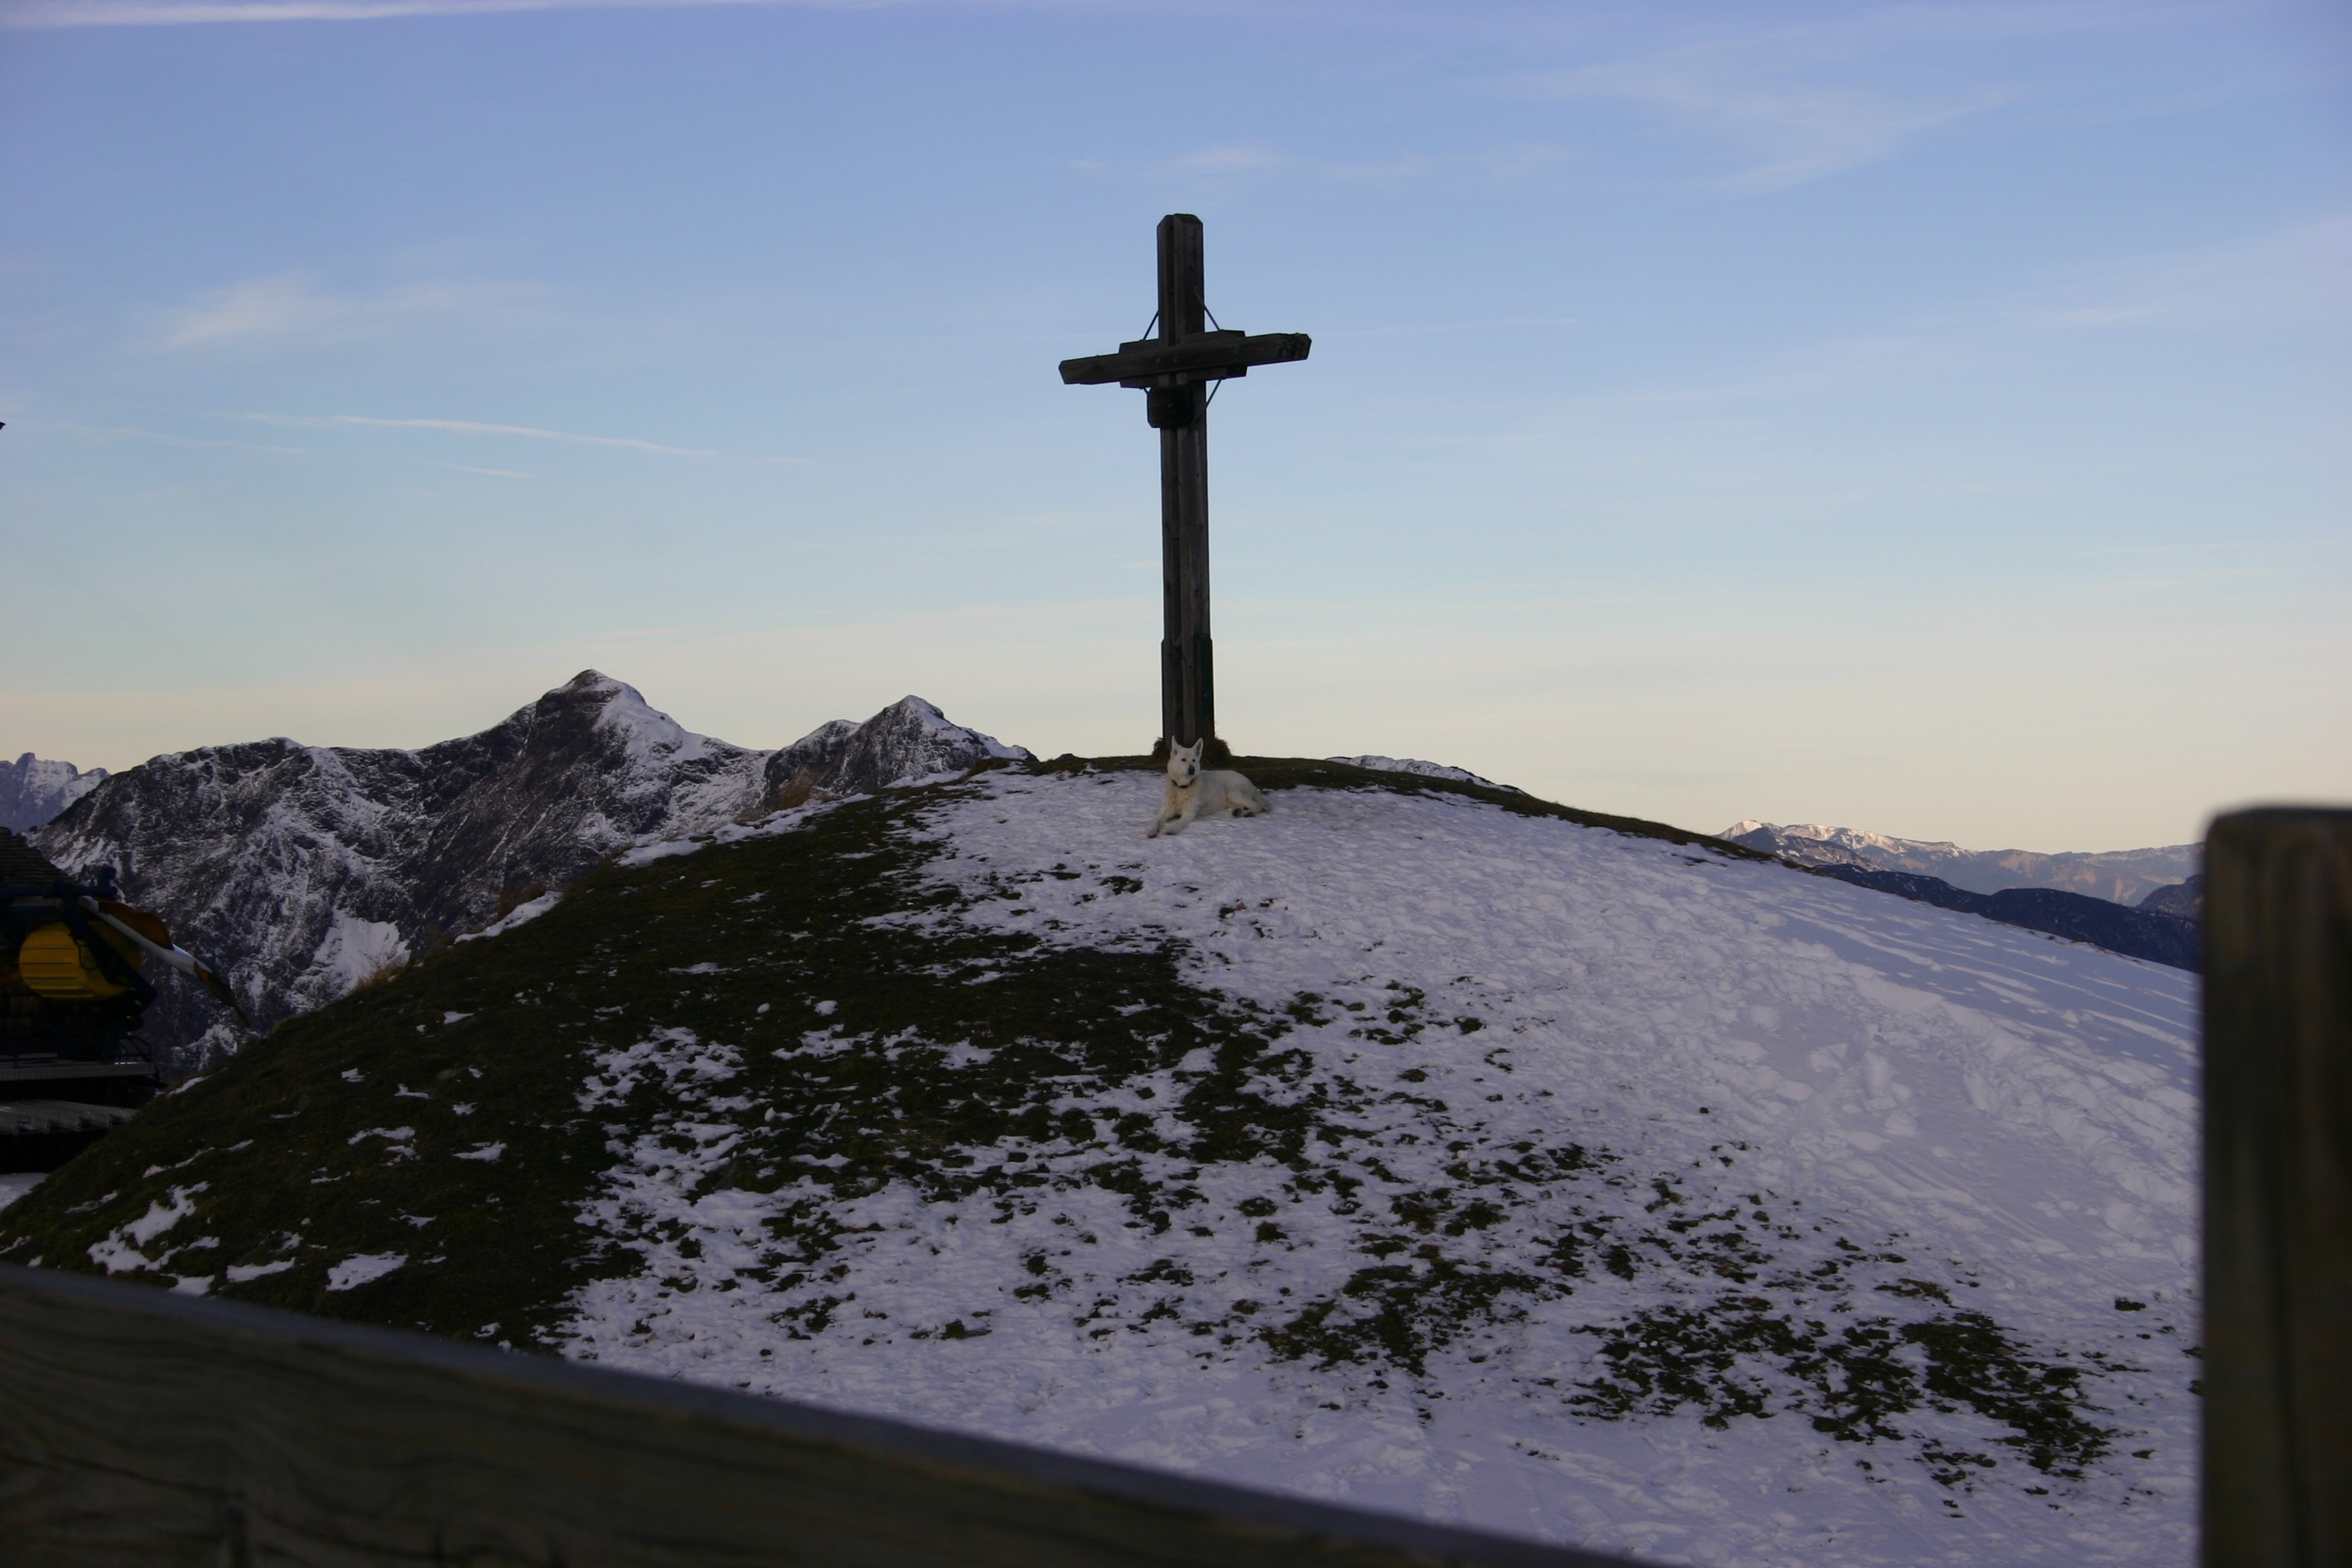 Skicircus Saalbach Hinterglemm Leogang 394 - Dag 4